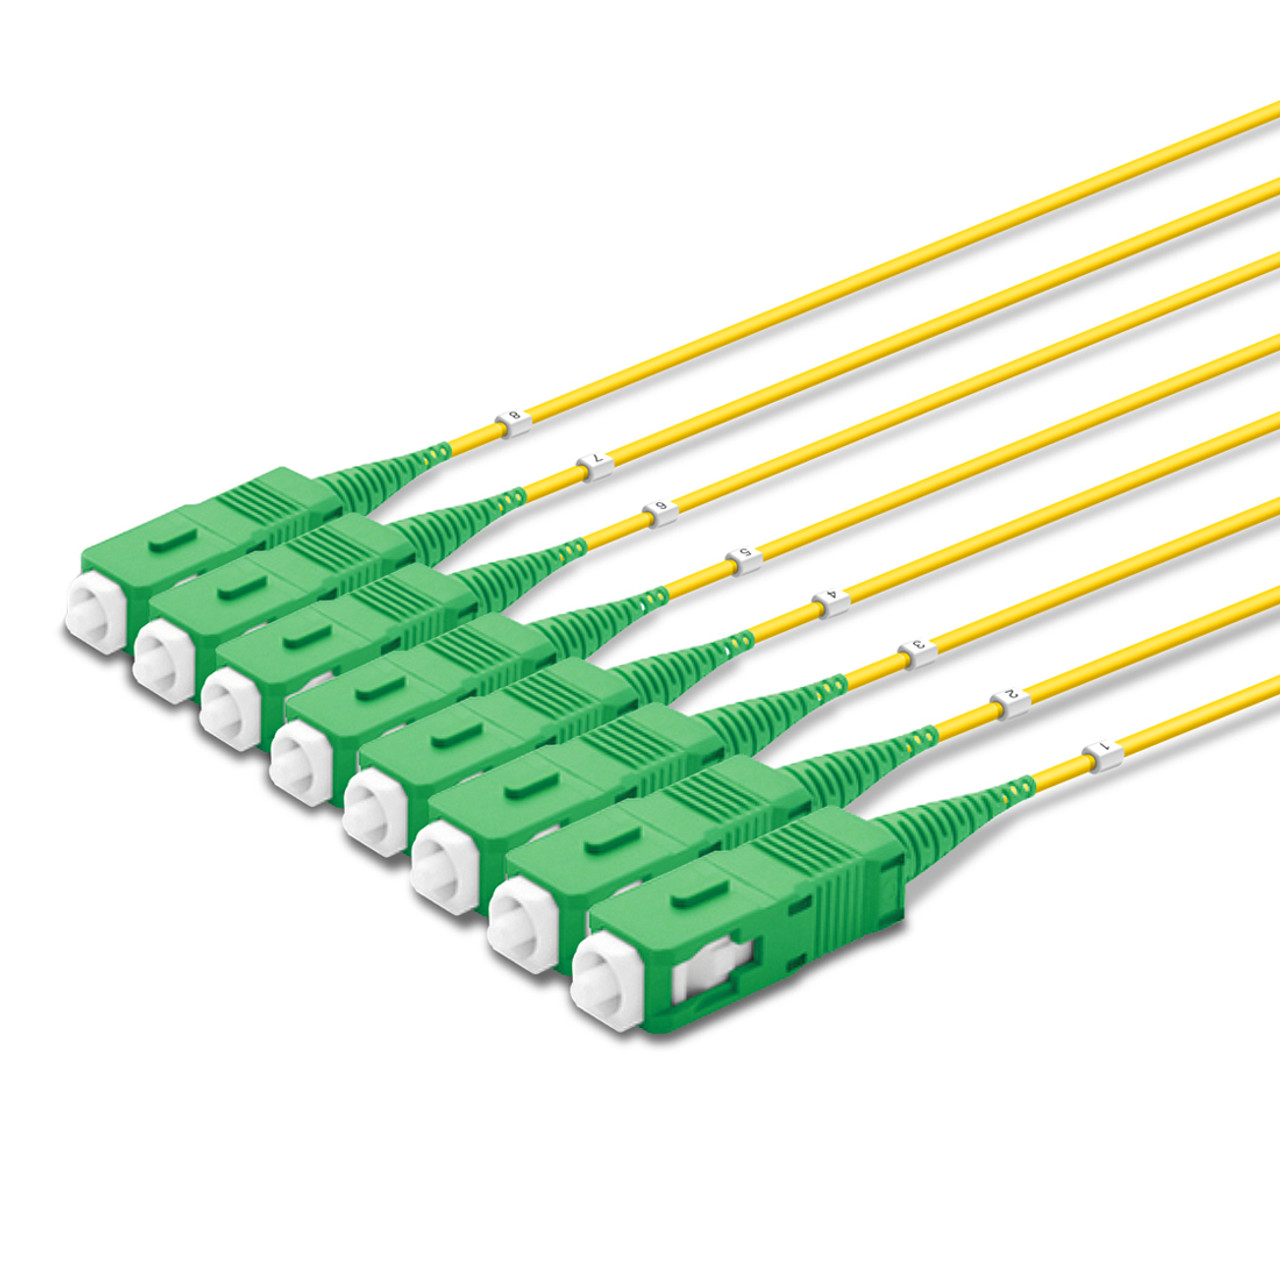 8 SC Simplex connectors, labelled, green